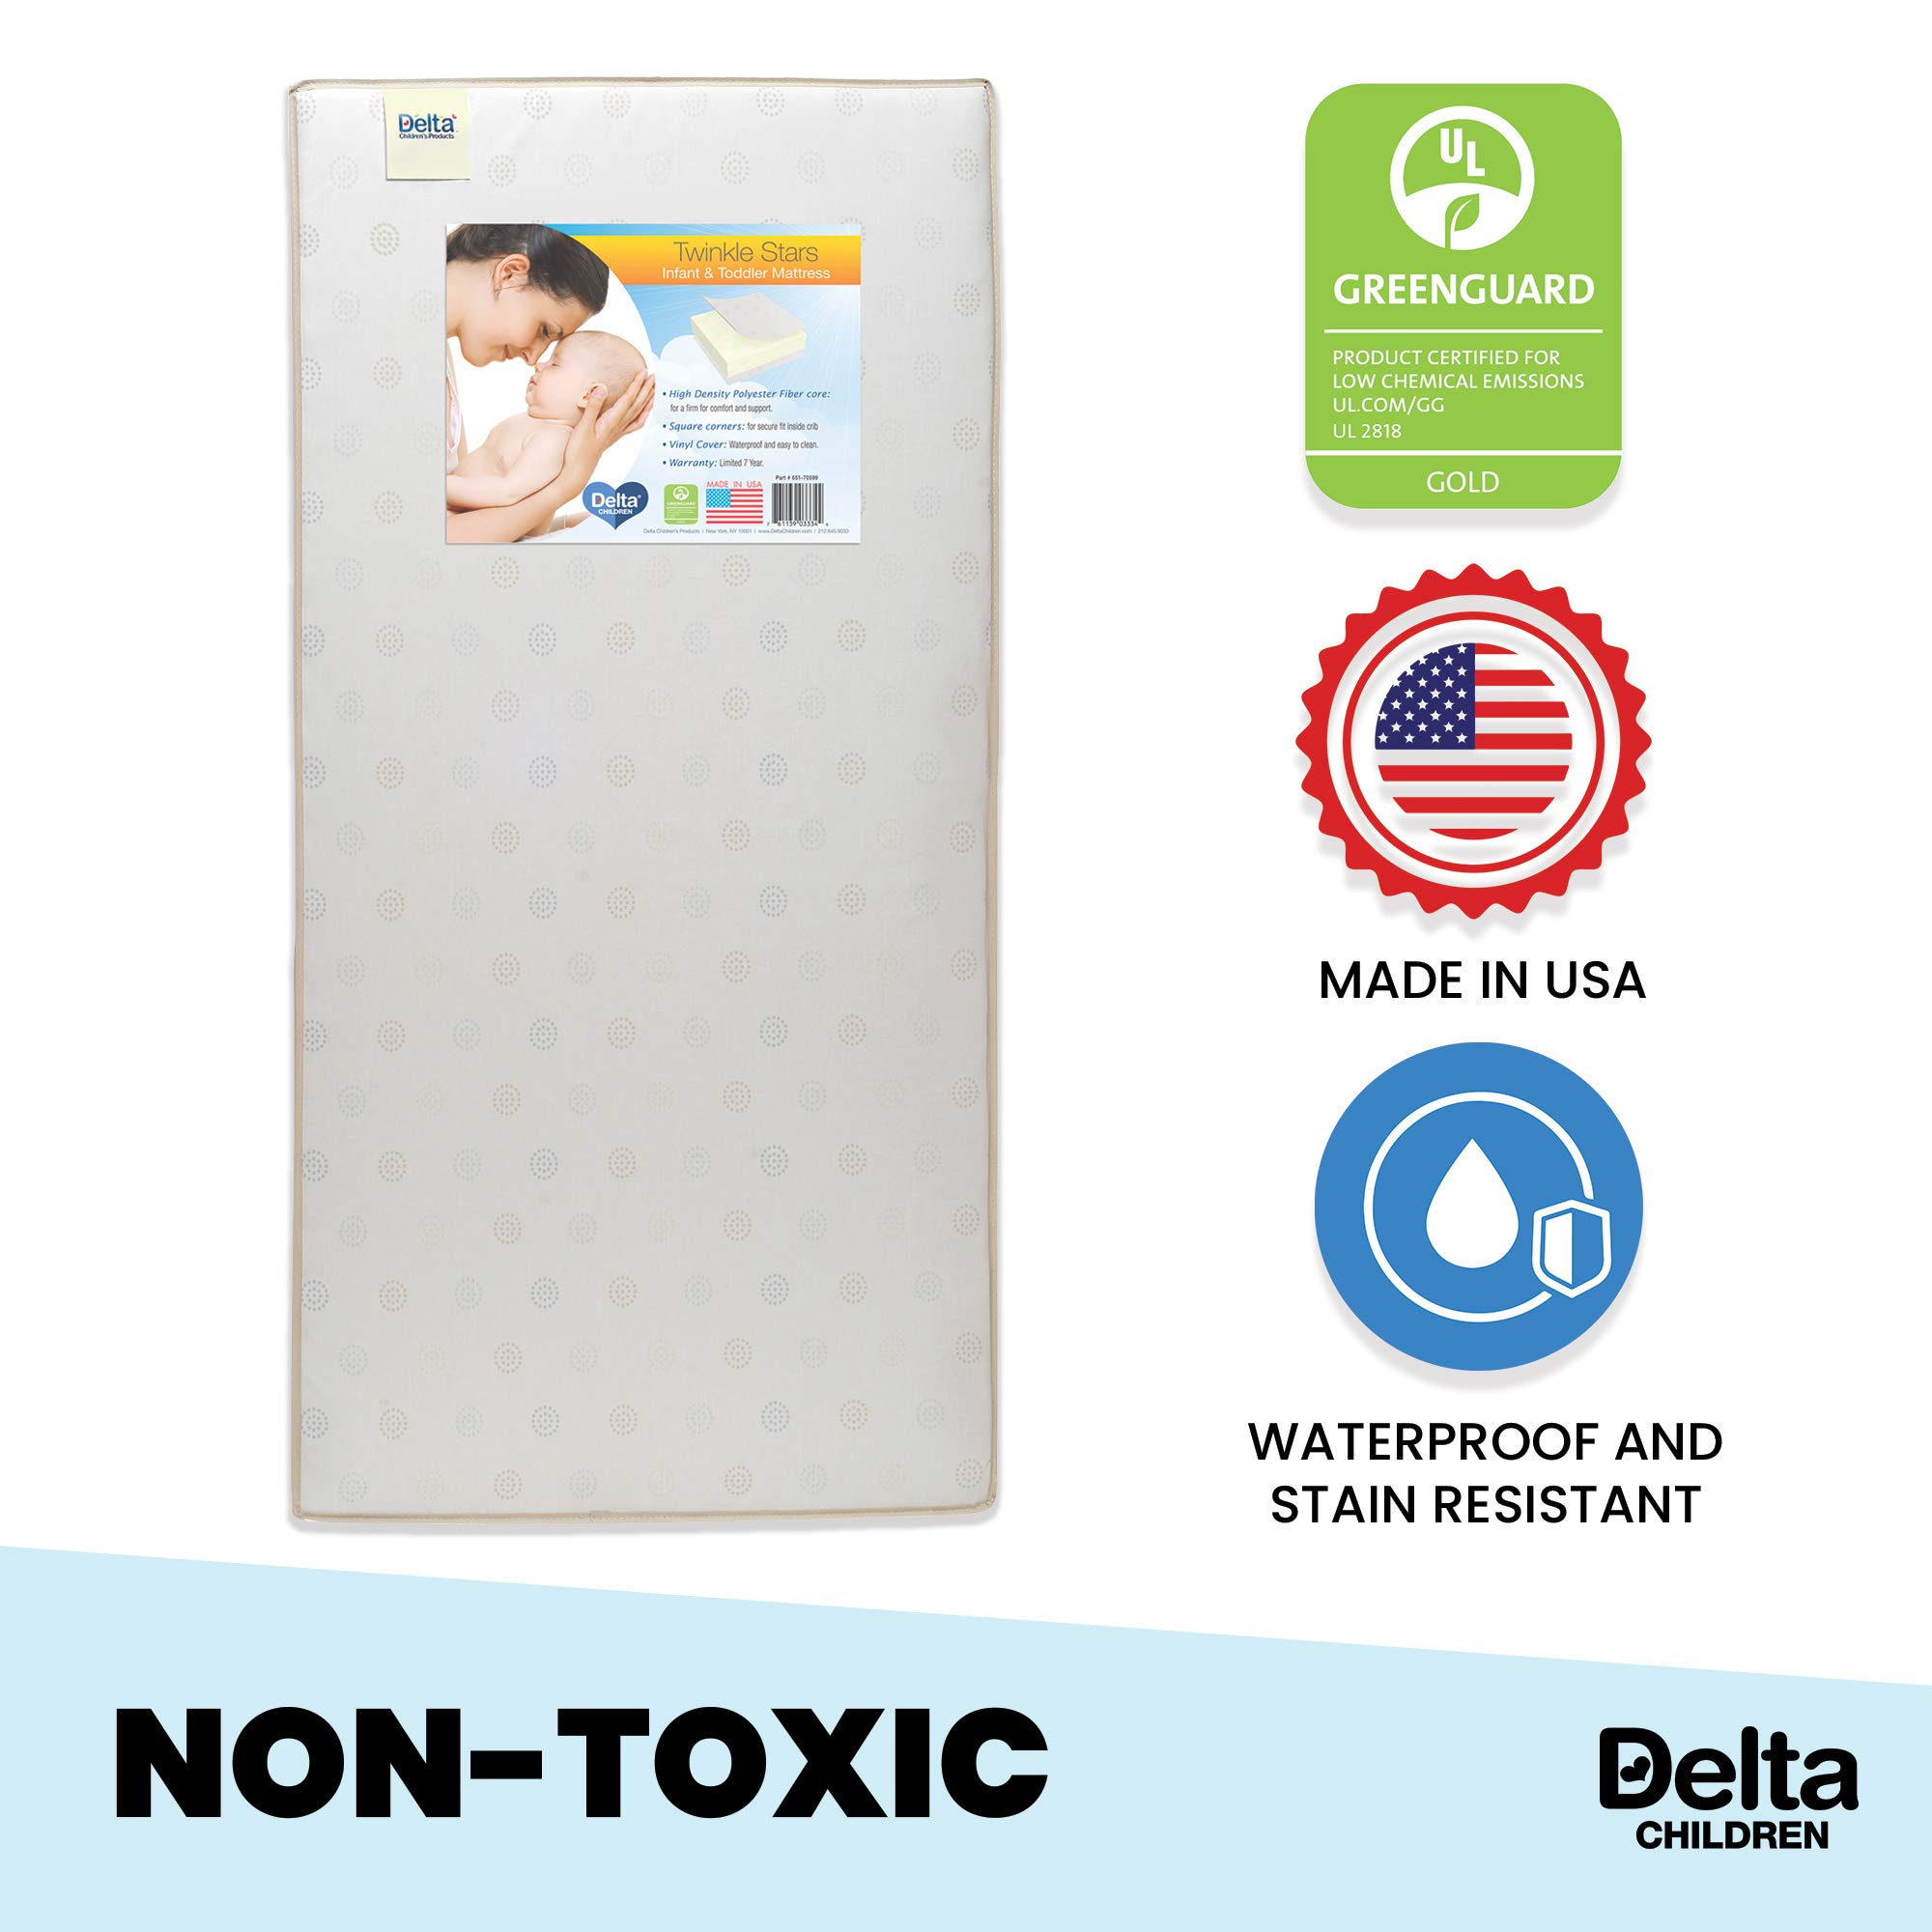 Delta Children Twinkle Stars Fiber Core Crib and Toddler Mattress | Waterproof | Lightweight | GREENGUARD Gold Certified (Natural/Non-Toxic) by Delta Children